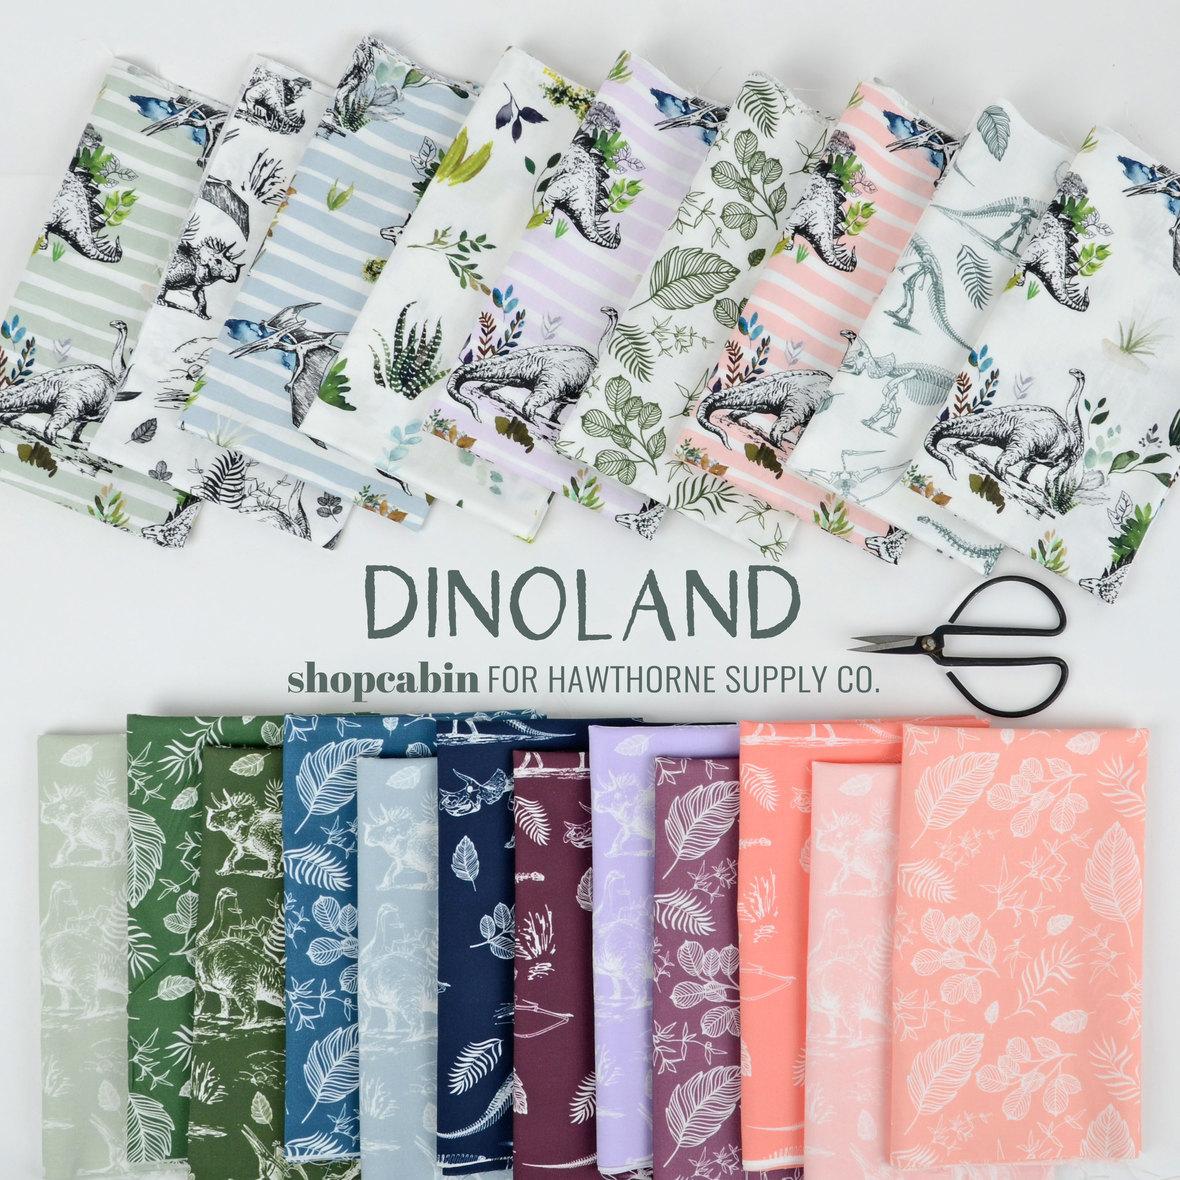 Dinoland-Fabric-Poster-dinosaur-Fabric-Shopcabin-for-Hawthorne-Supply-Co